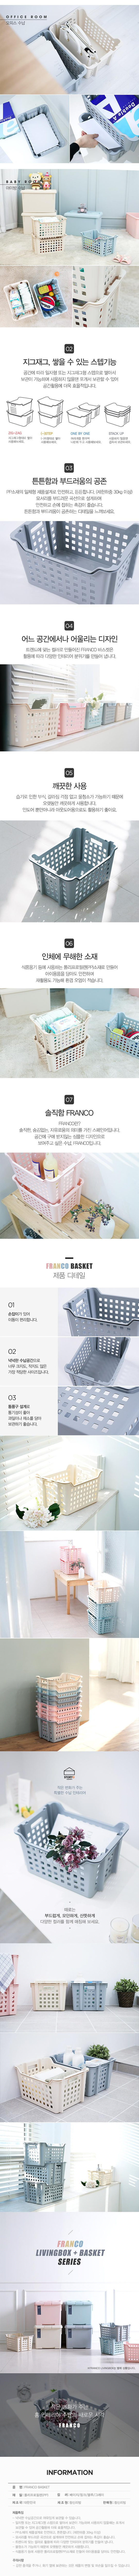 FRANCO 바스켓 - 창신리빙, 7,800원, 정리/리빙박스, 플라스틱 리빙박스